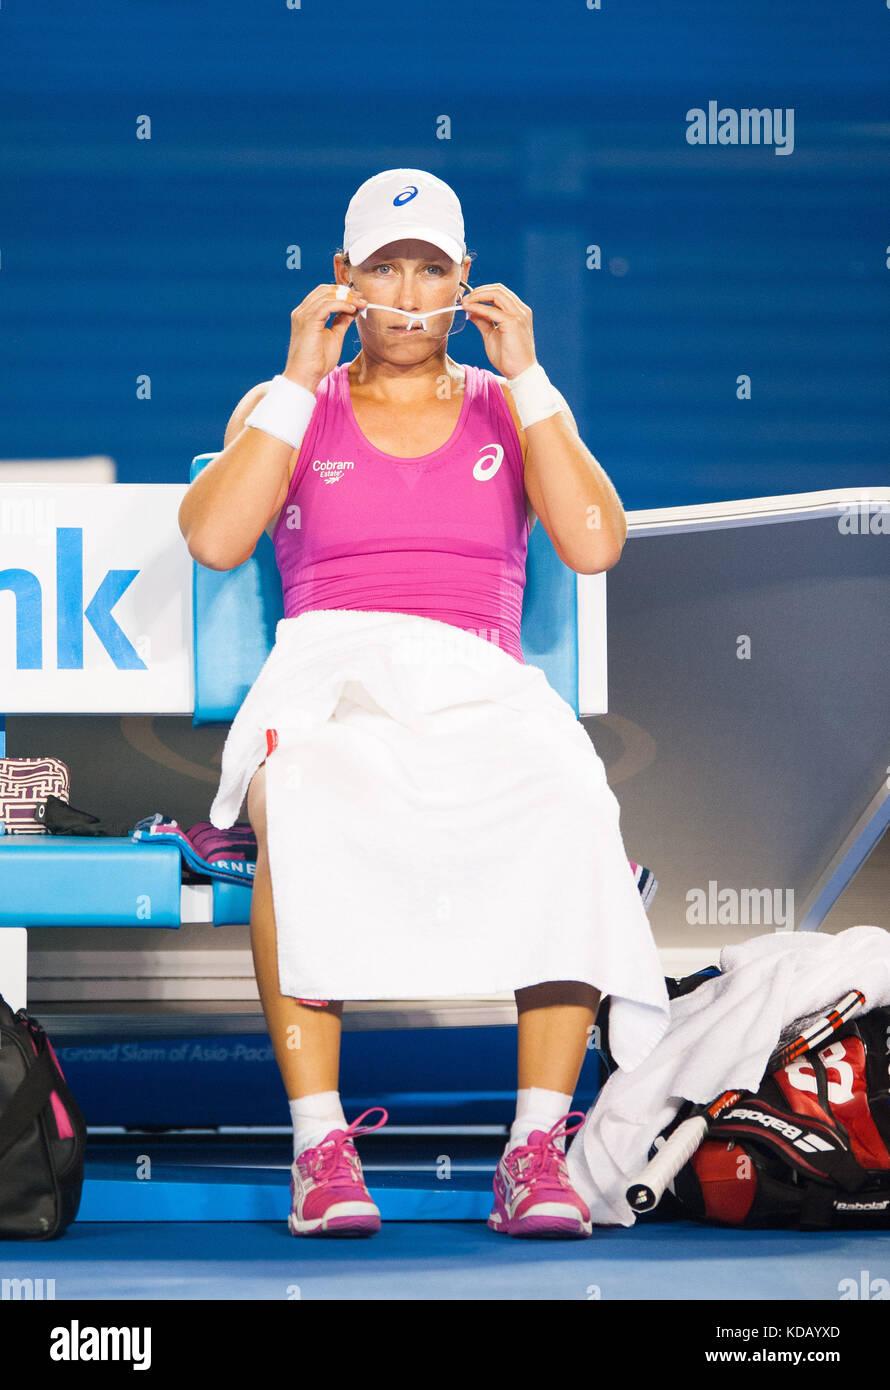 Samantha Strosur (AUS) battled A. Ivanovic (SRB) in day 5 of the Australian Open Women's Singles. Ivanovic won - Stock Image